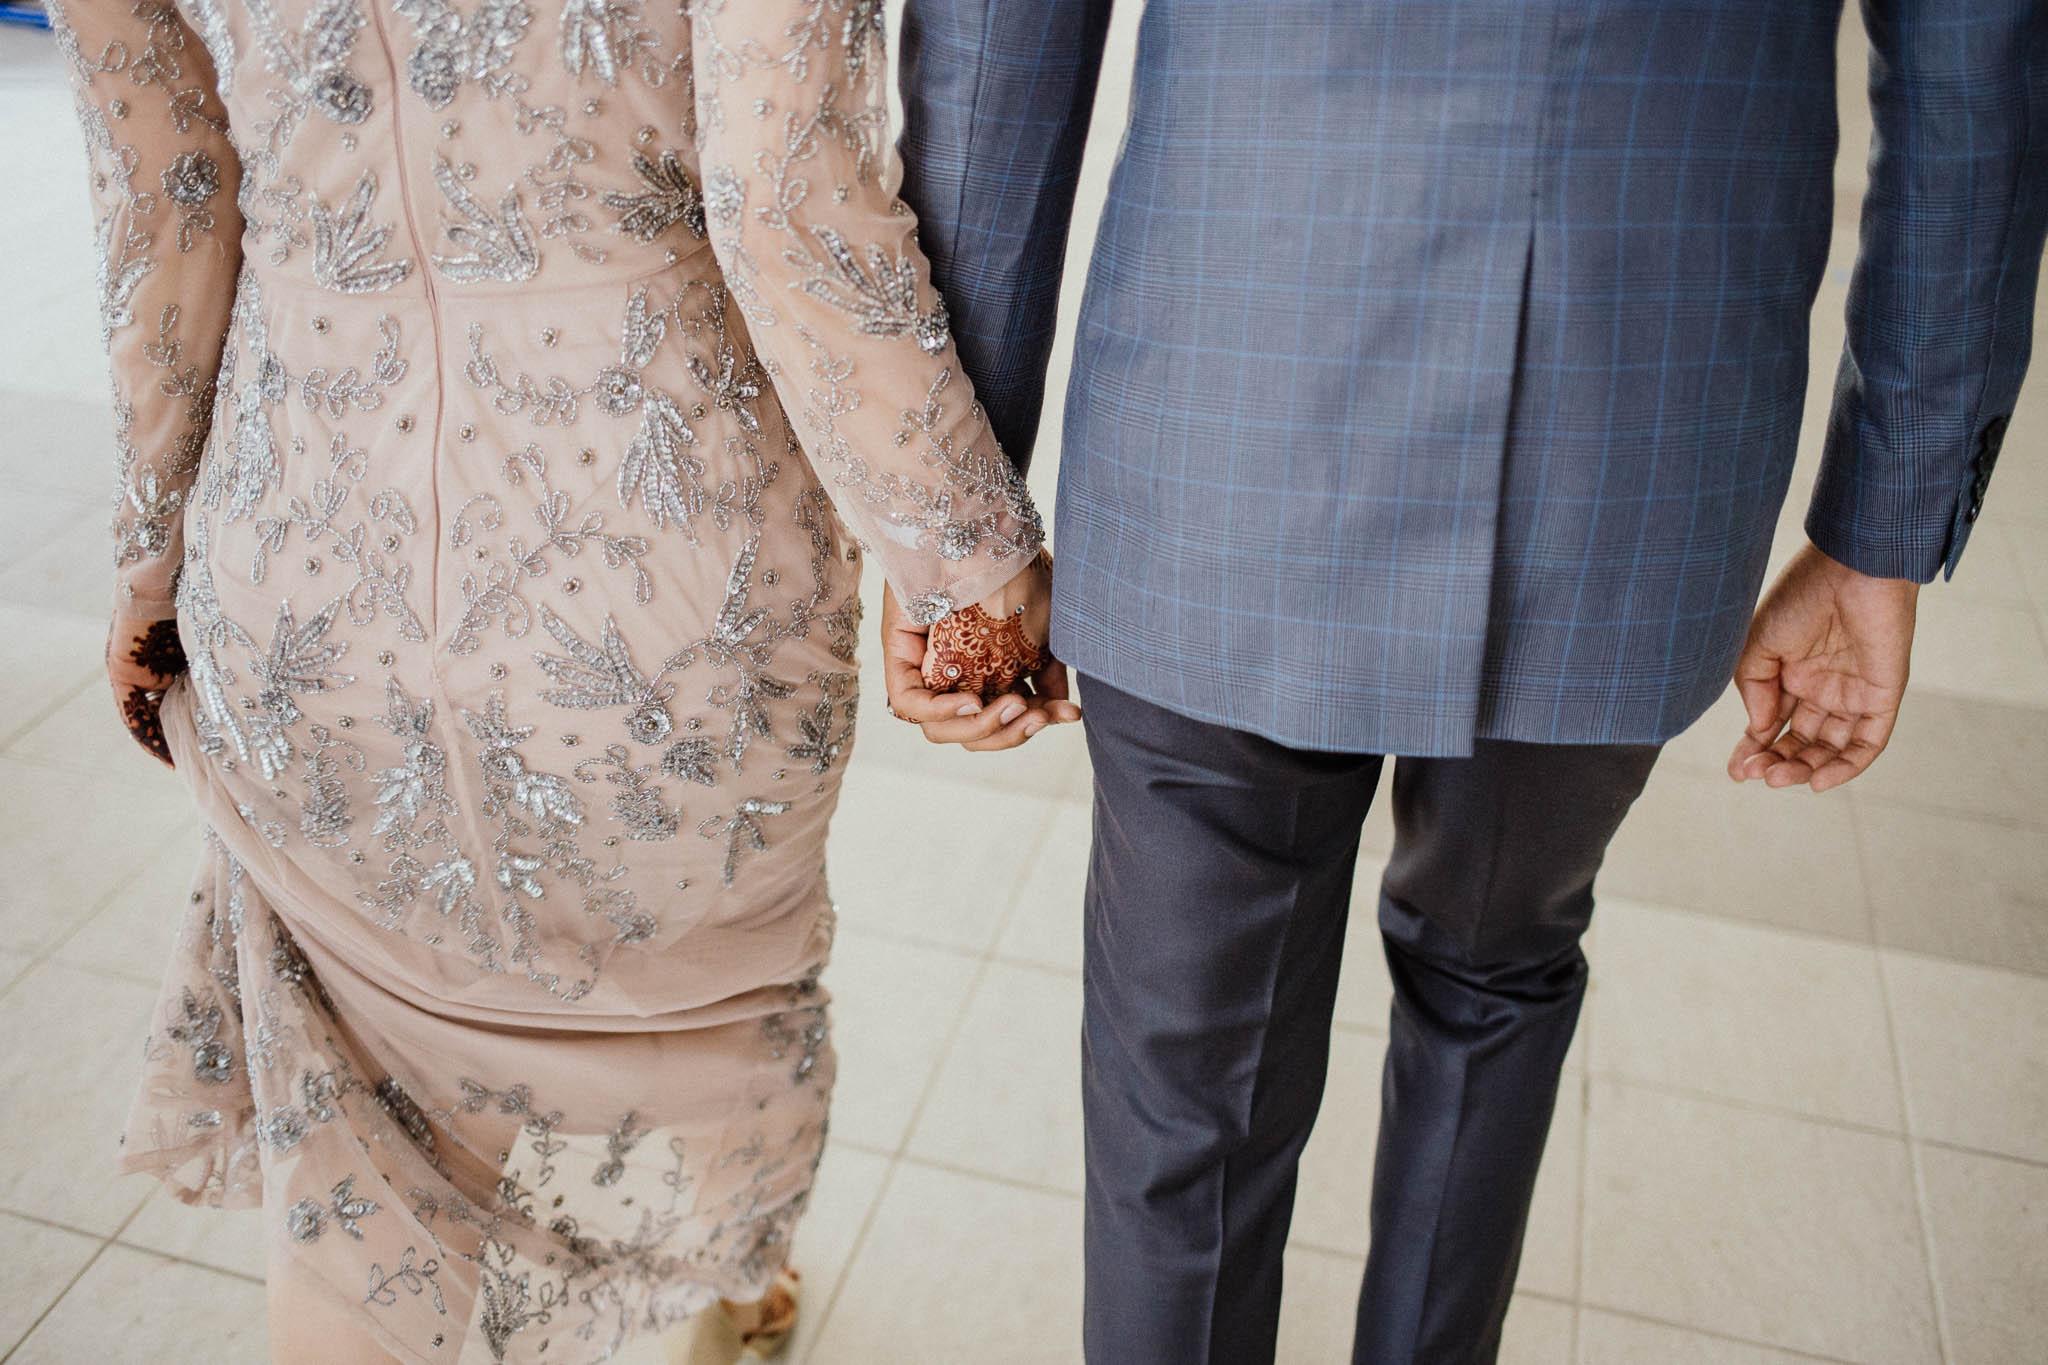 singapore-wedding-photographer-wedding-nufail-addafiq-043.jpg